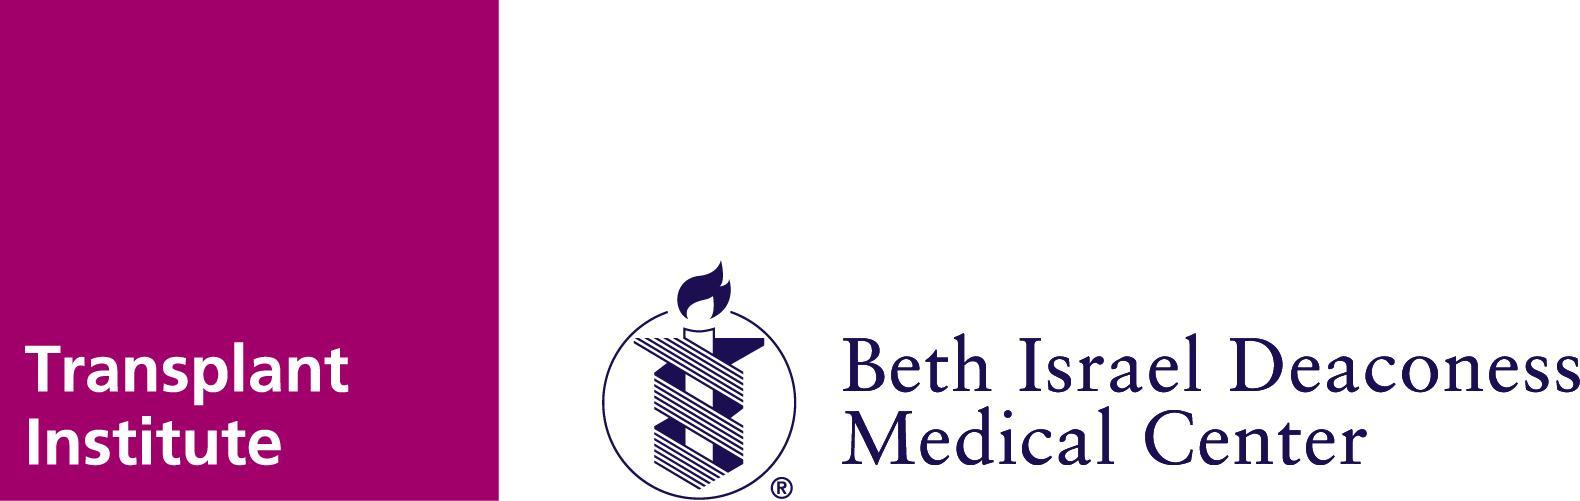 Transplant Institute Beth Israel Deaconess Medical Center